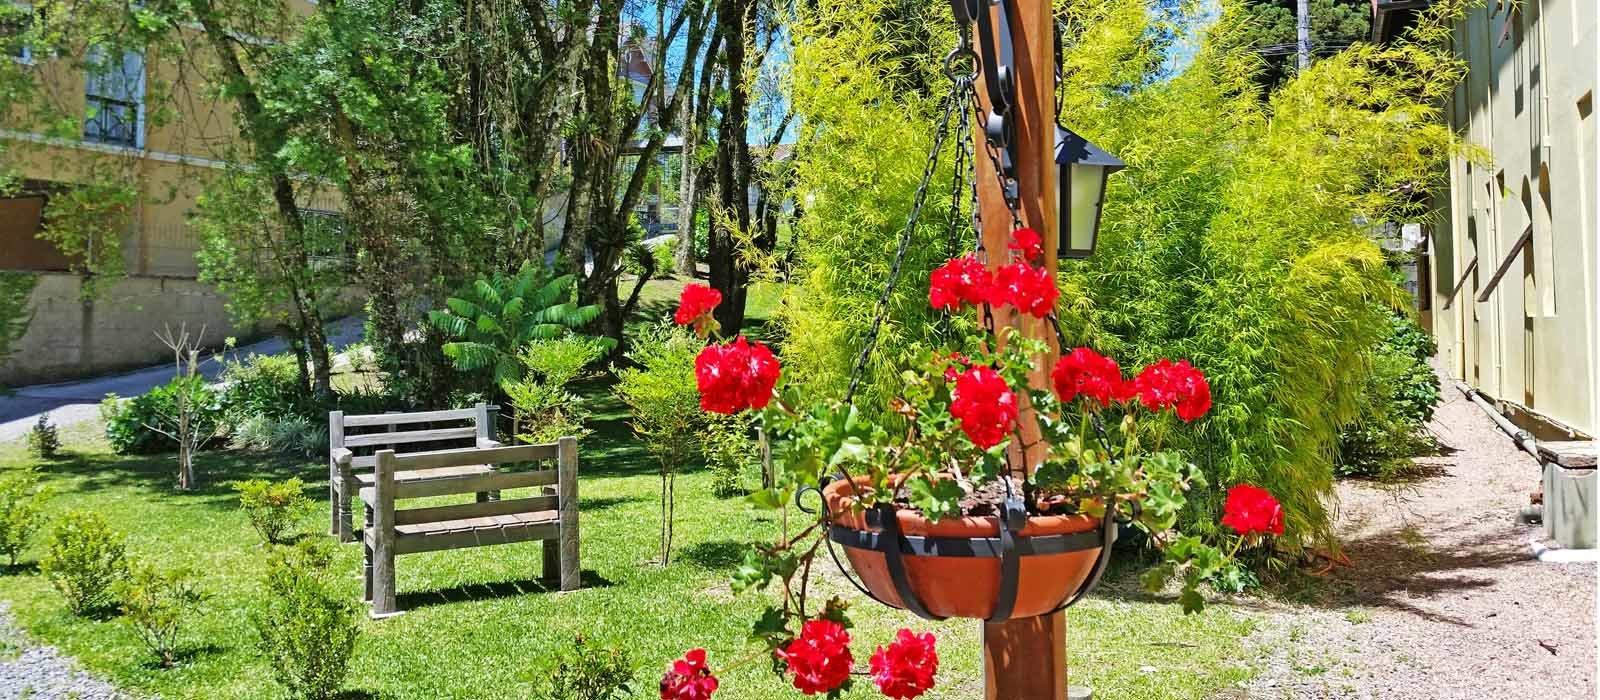 pousada canela jardins